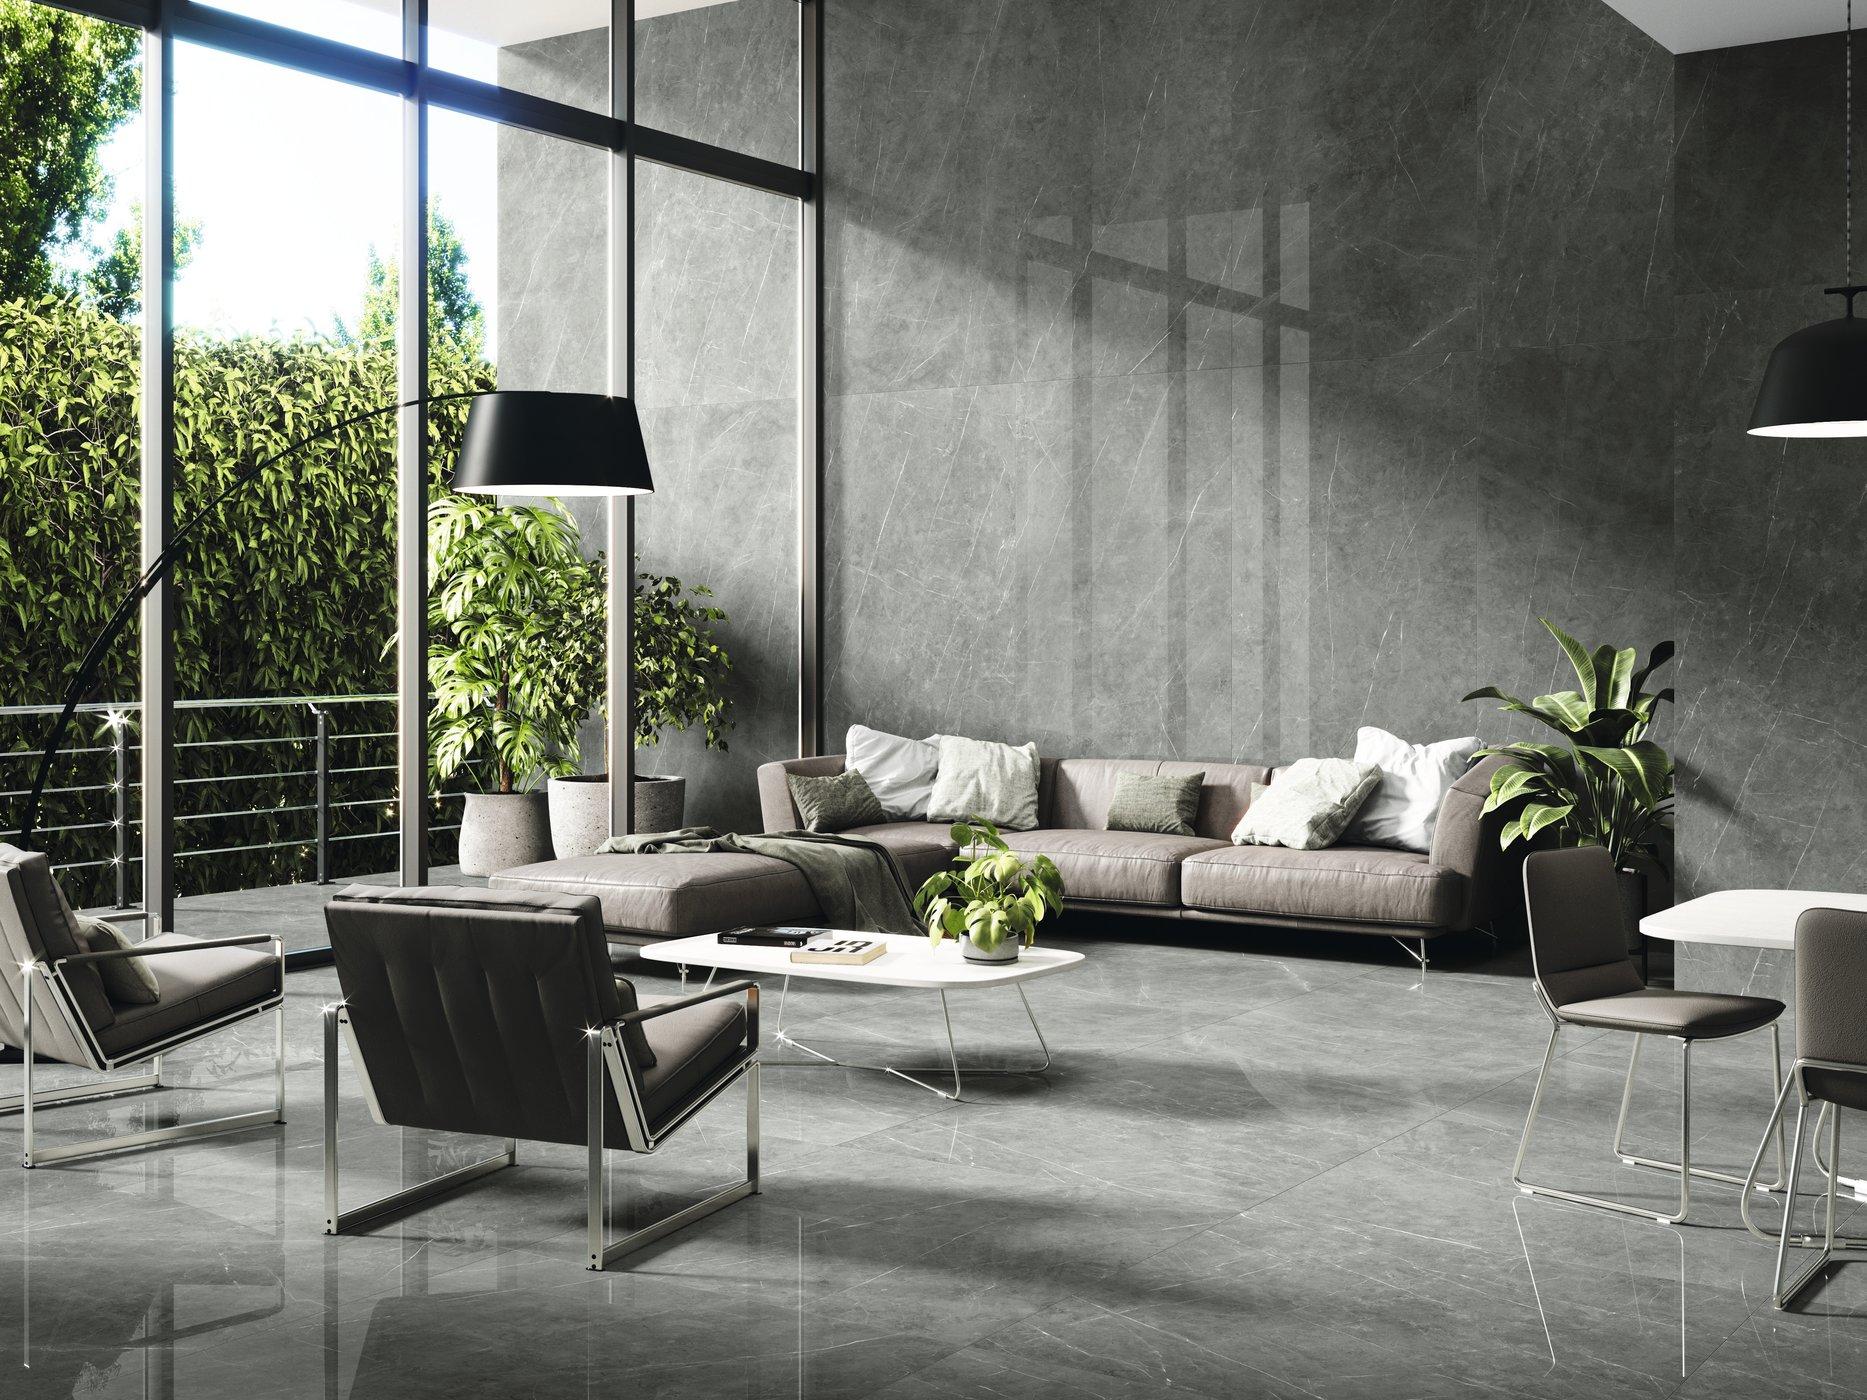 Tessino Grey Pulido 260 x 120 cm. Pavimento Tessino Grey Pulido 120 x 120 cm.